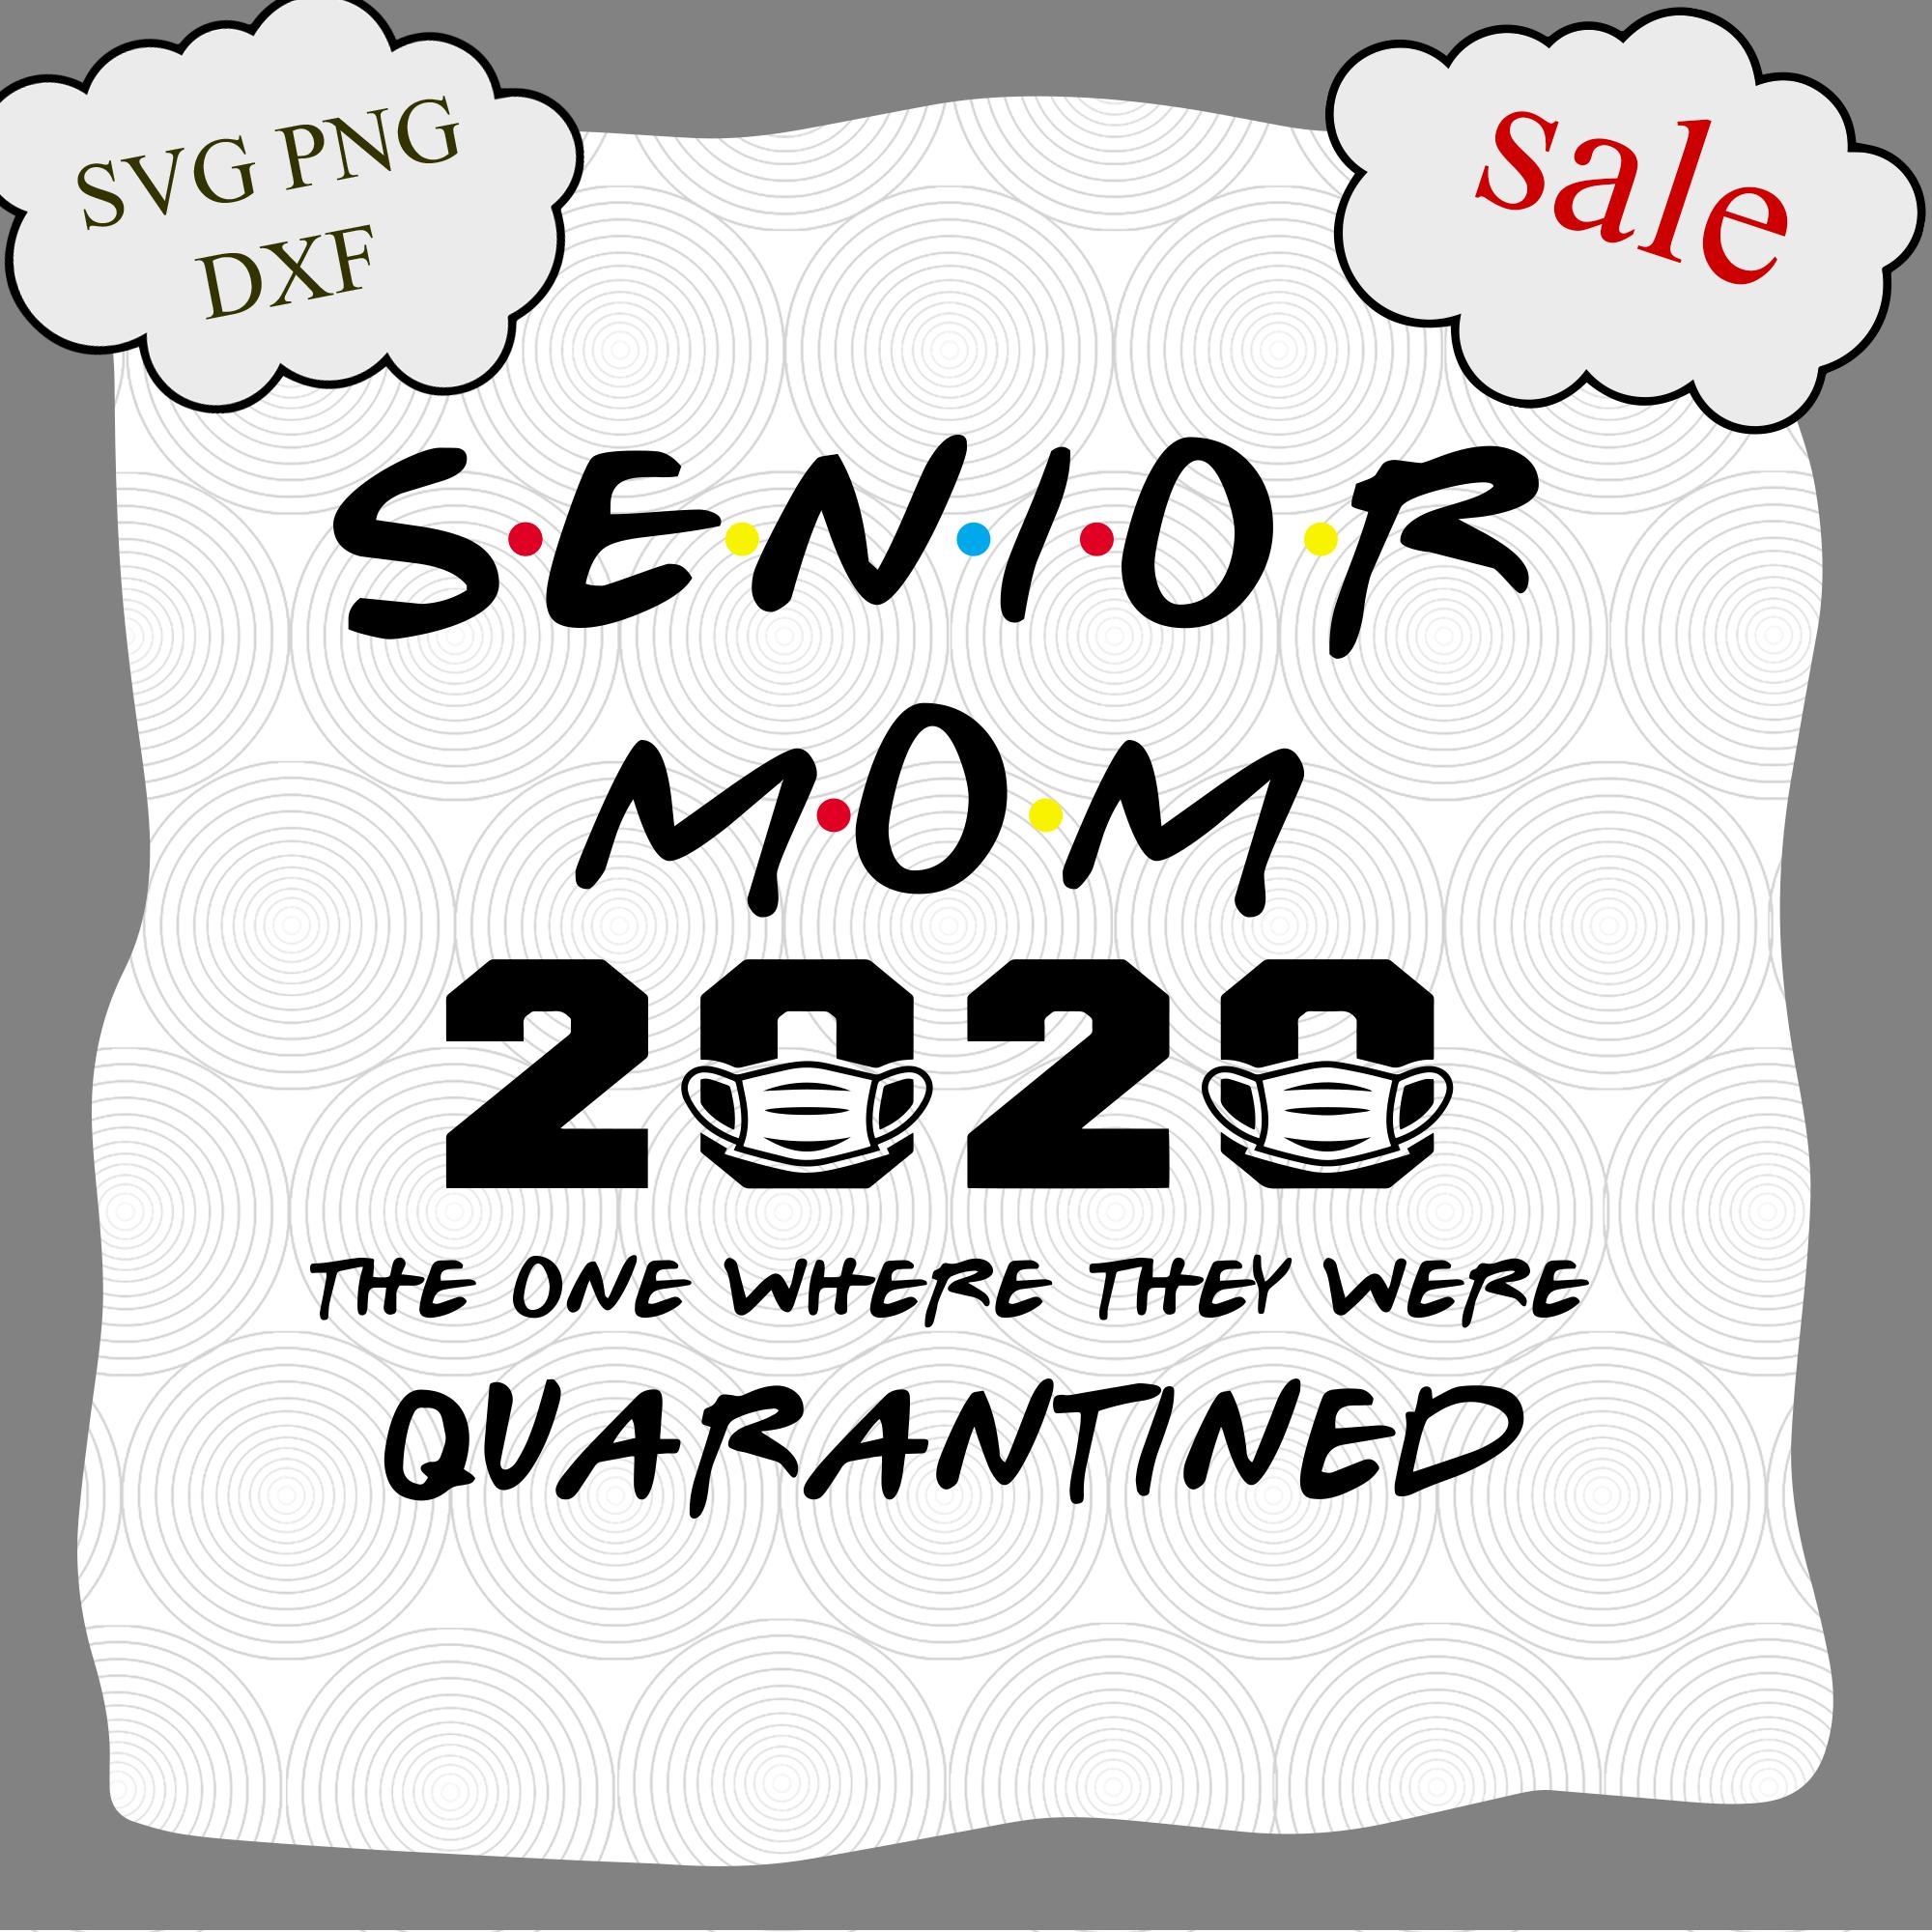 Senior Mom 2020 Svg The One Where We Were By Digital4u On Zibbet